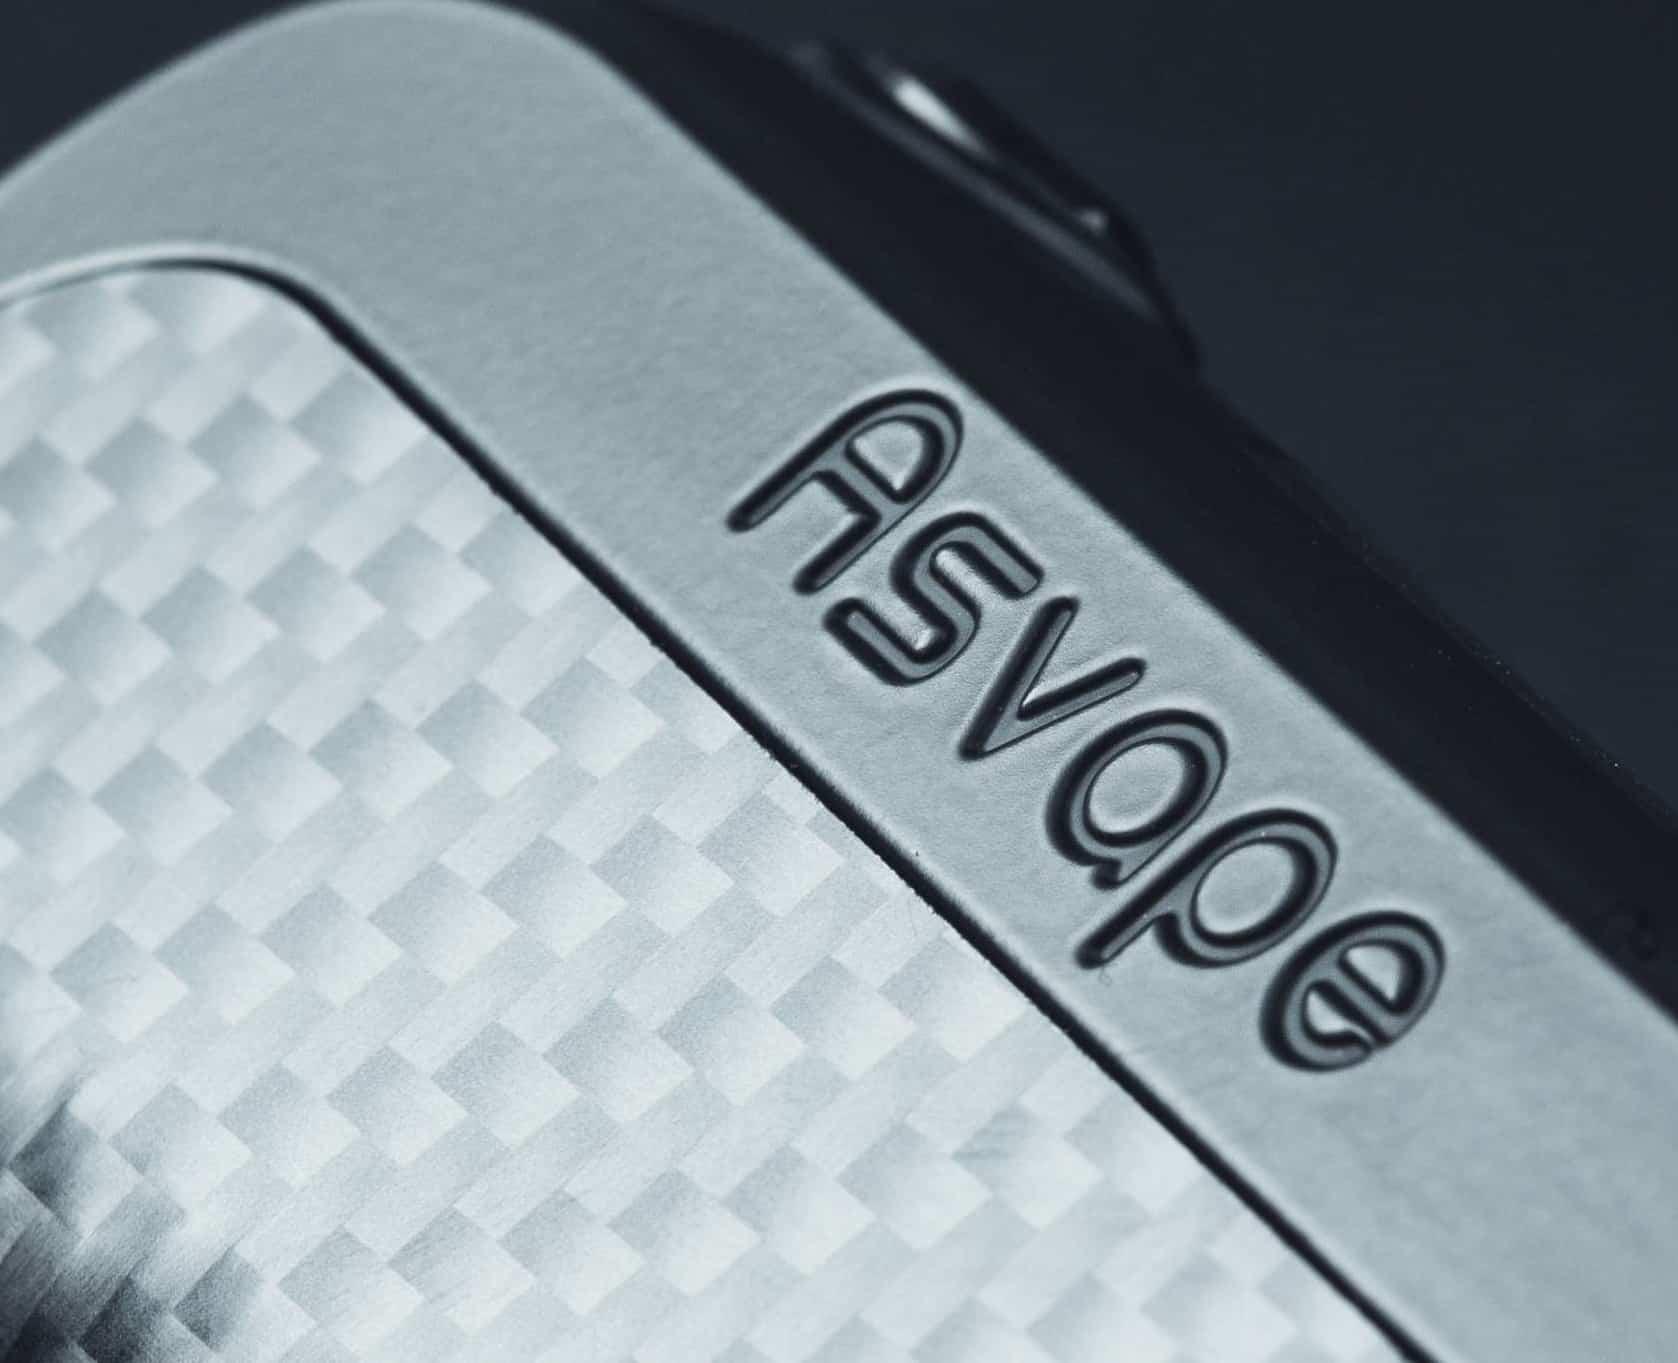 Asvape logo on product